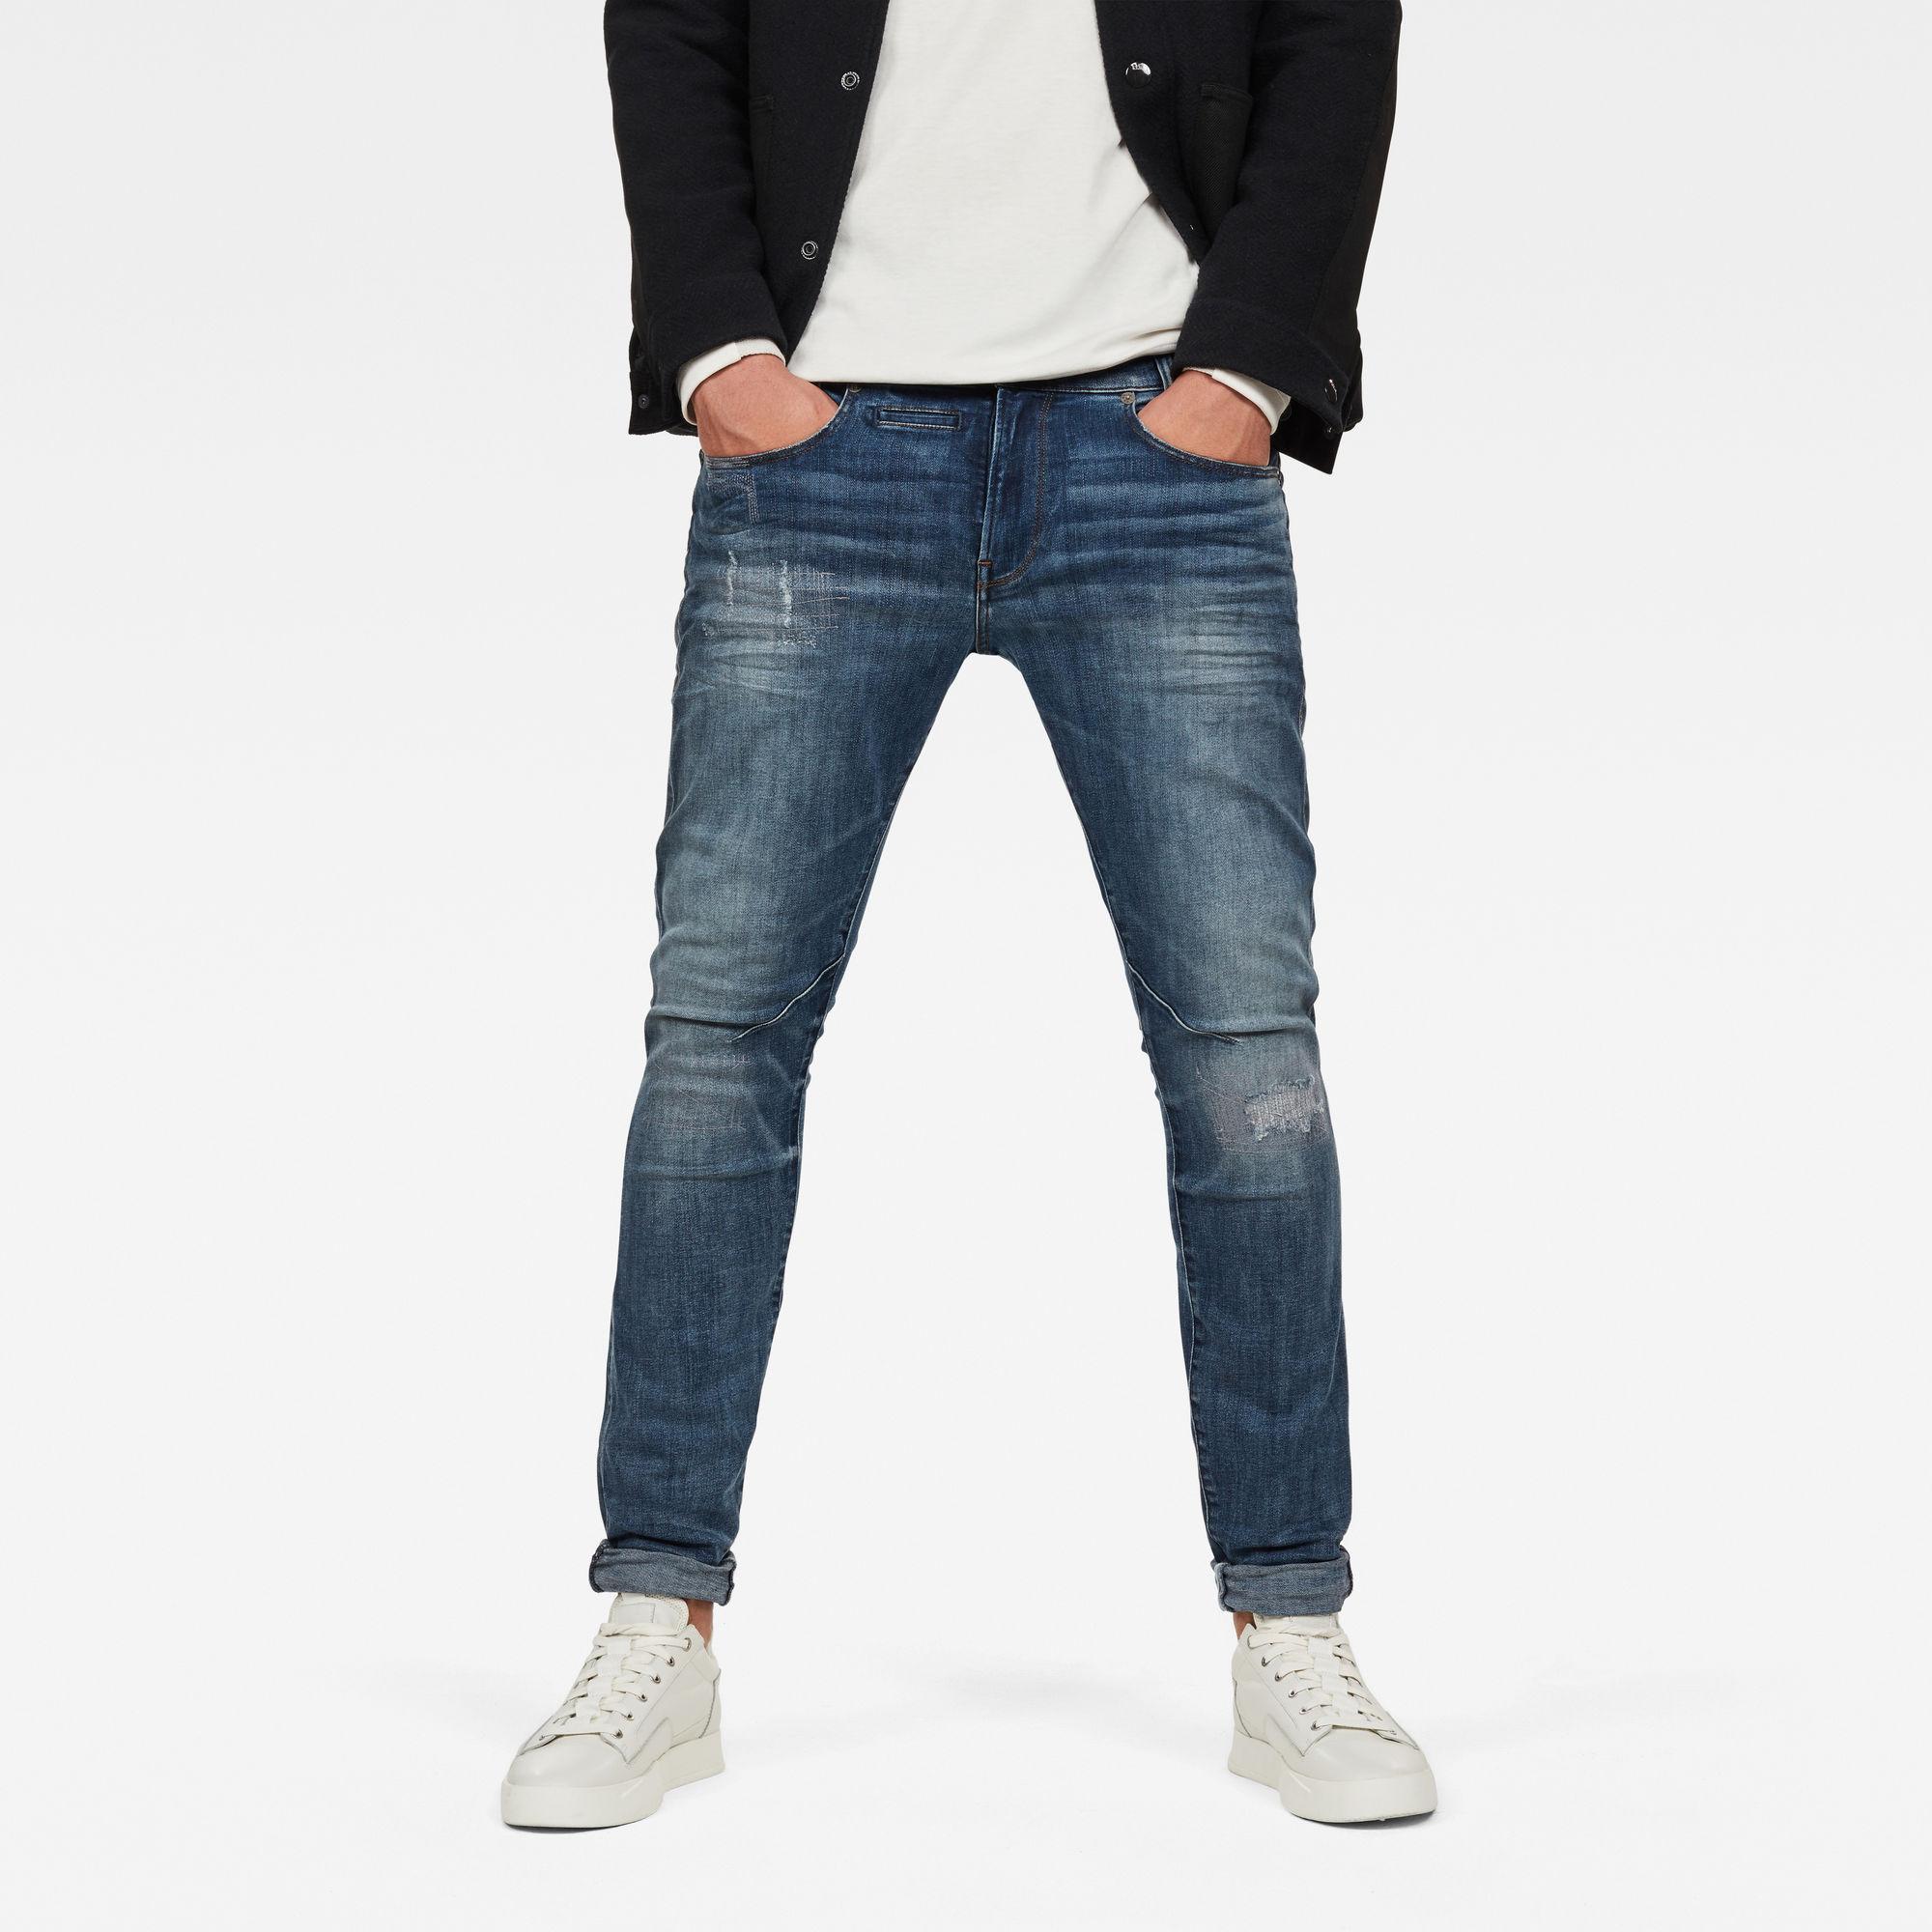 Image of G Star Raw D-Staq 5-Pocket Skinny Jeans